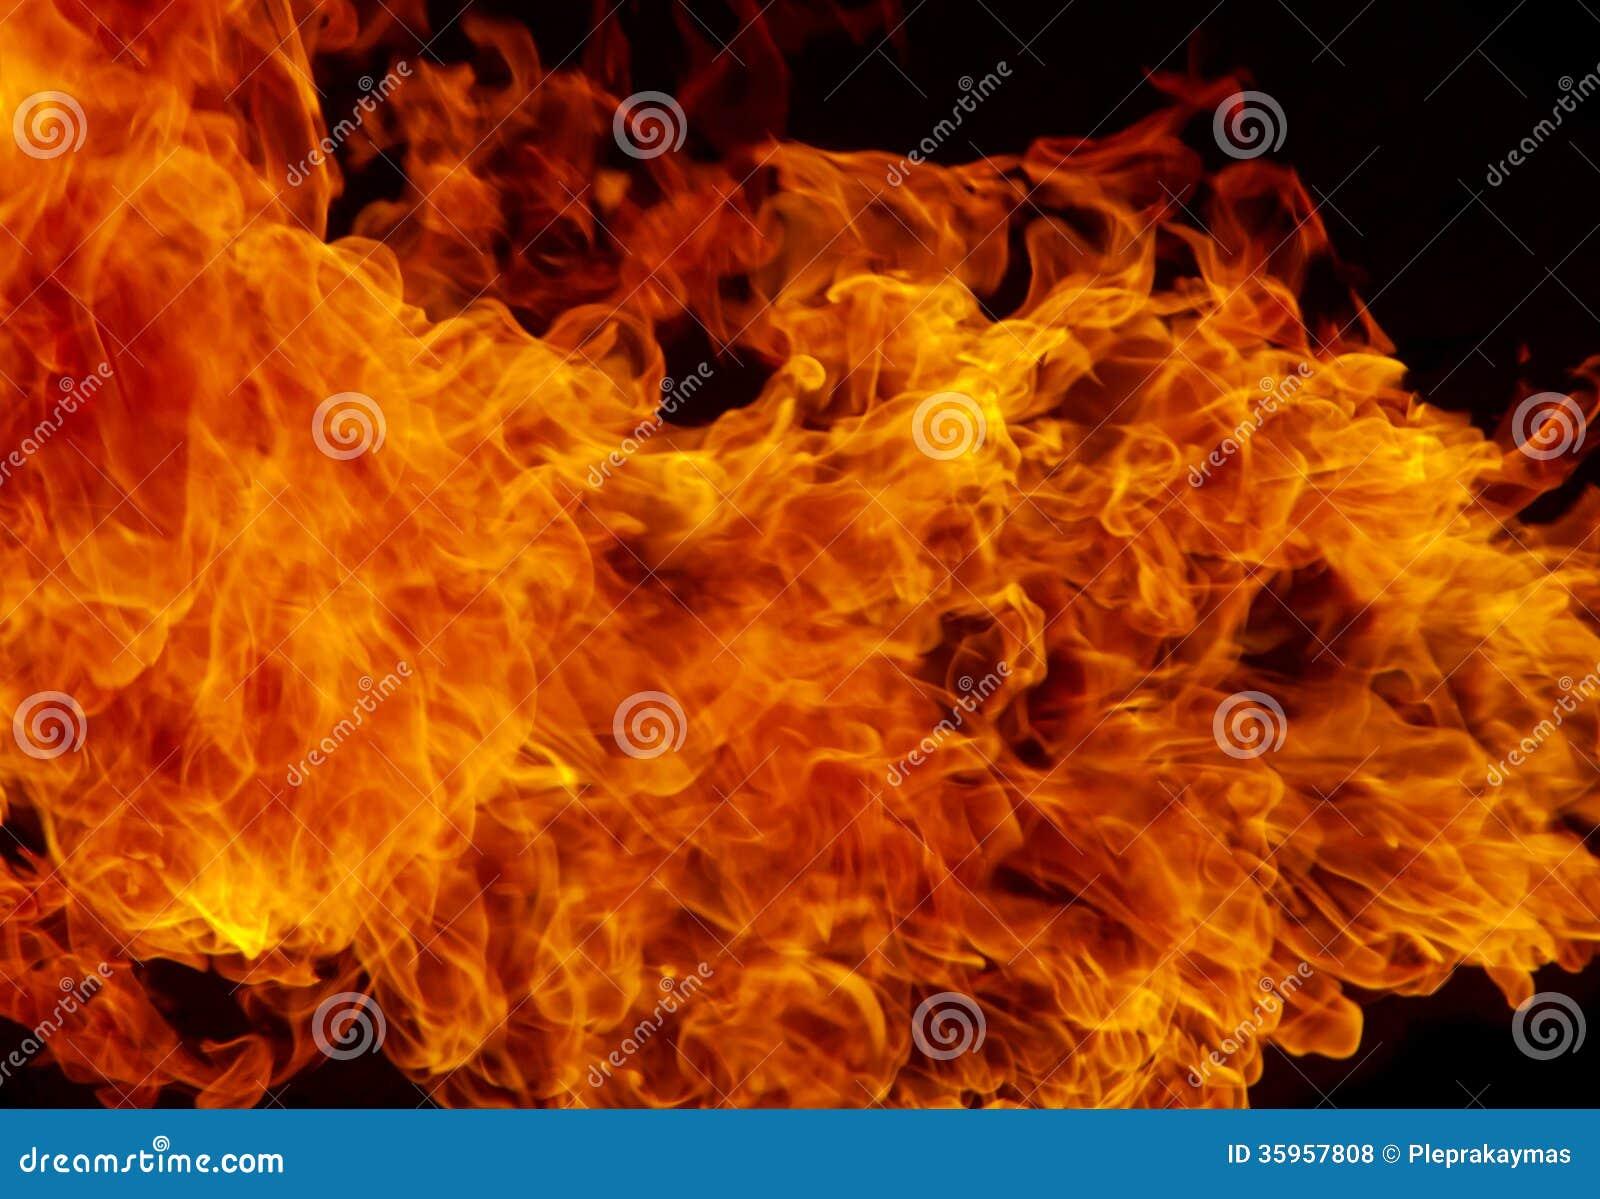 fond de texture de flamme du feu de flamme photos libres. Black Bedroom Furniture Sets. Home Design Ideas